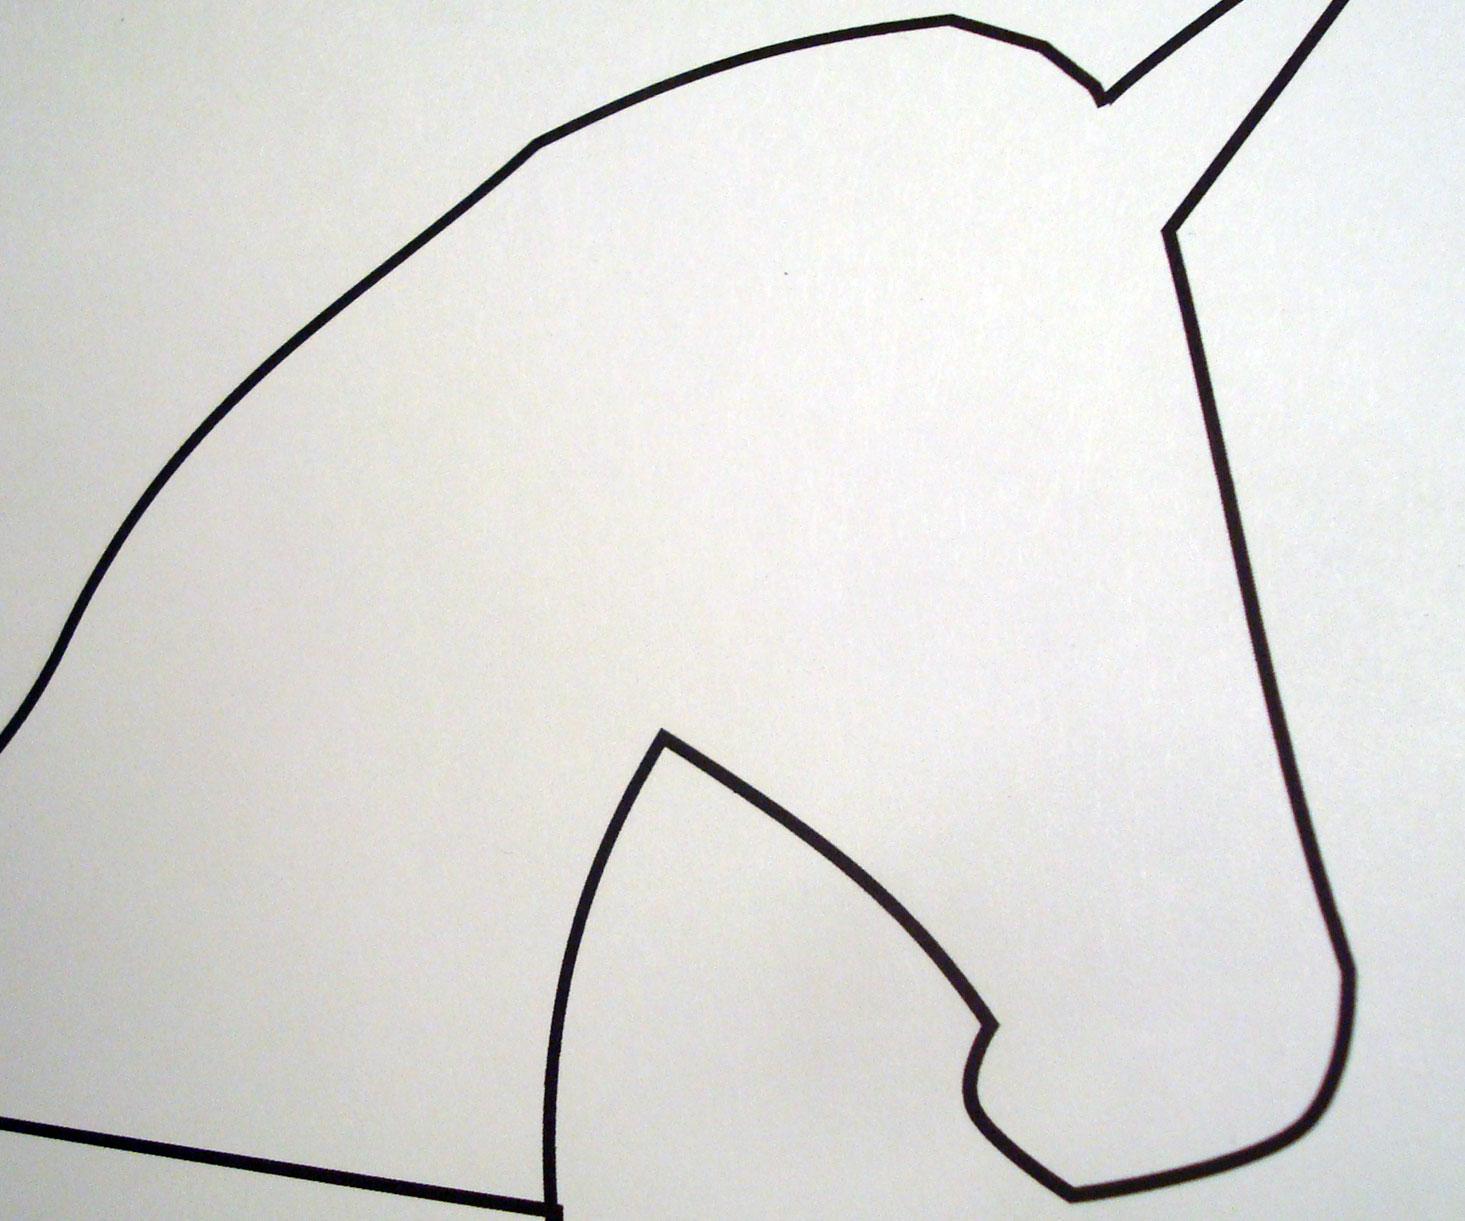 Shape of Unicorn Head